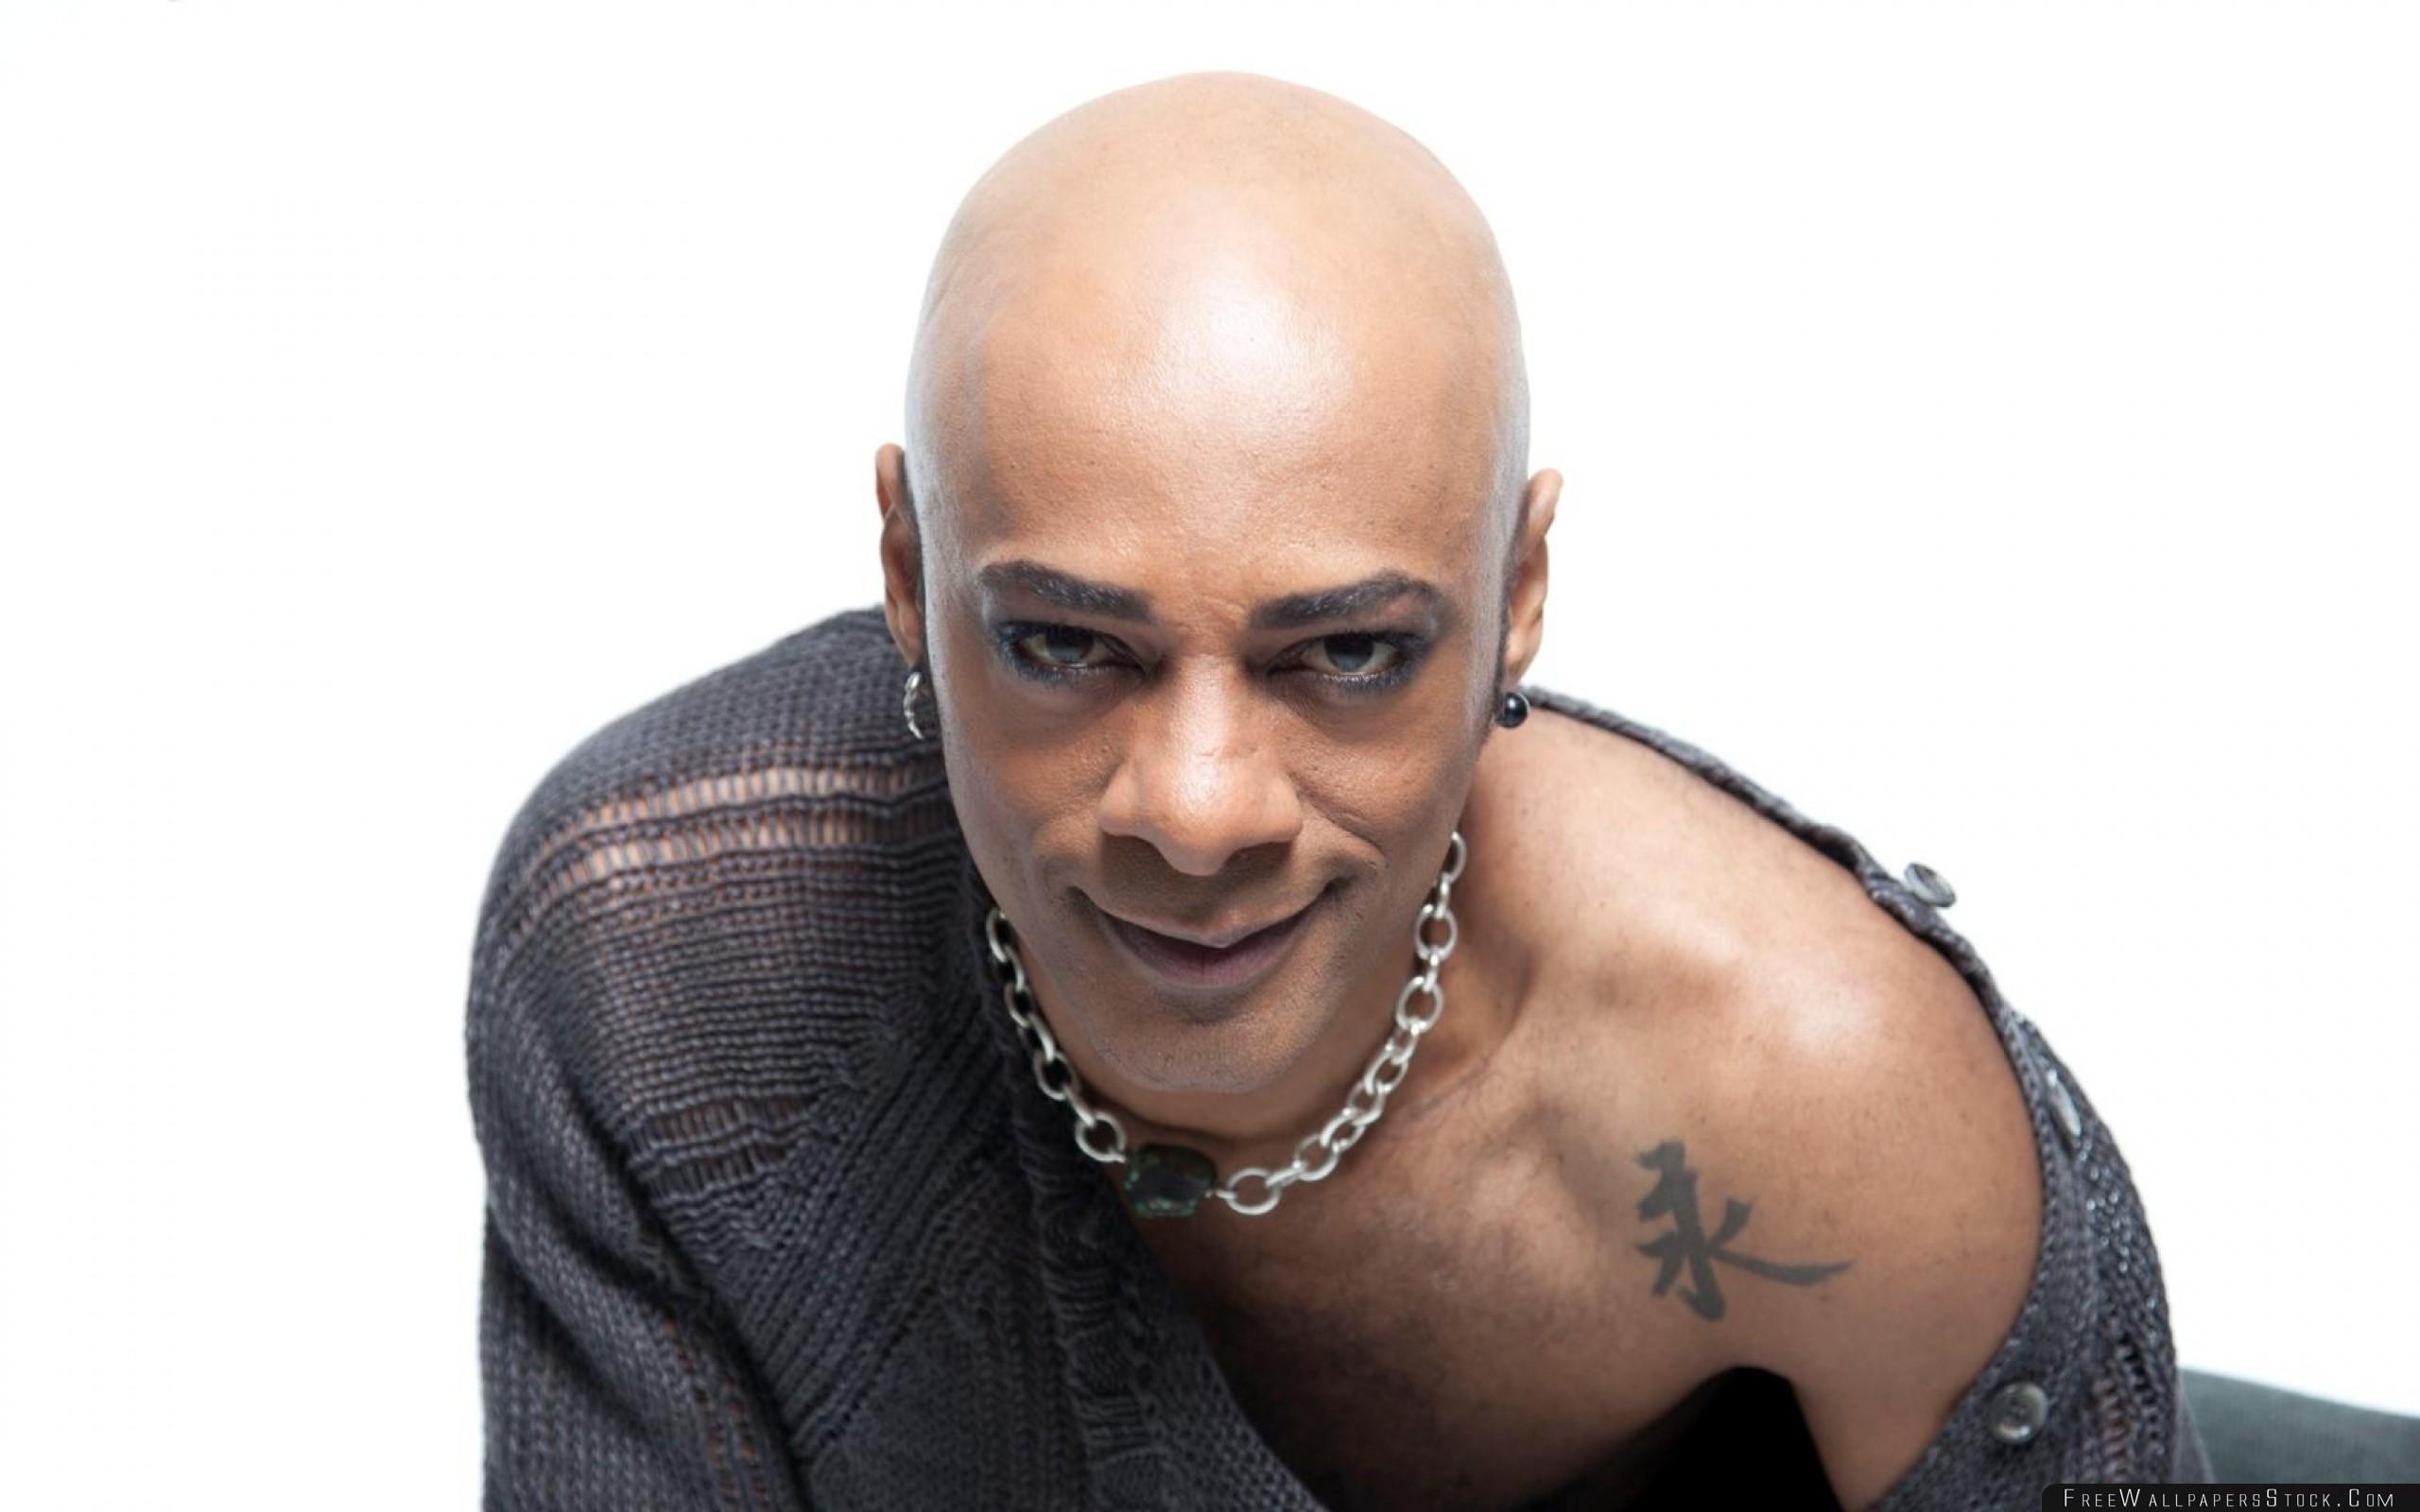 Download Free Wallpaper Percival Bald Shoulder Chain Tattoo